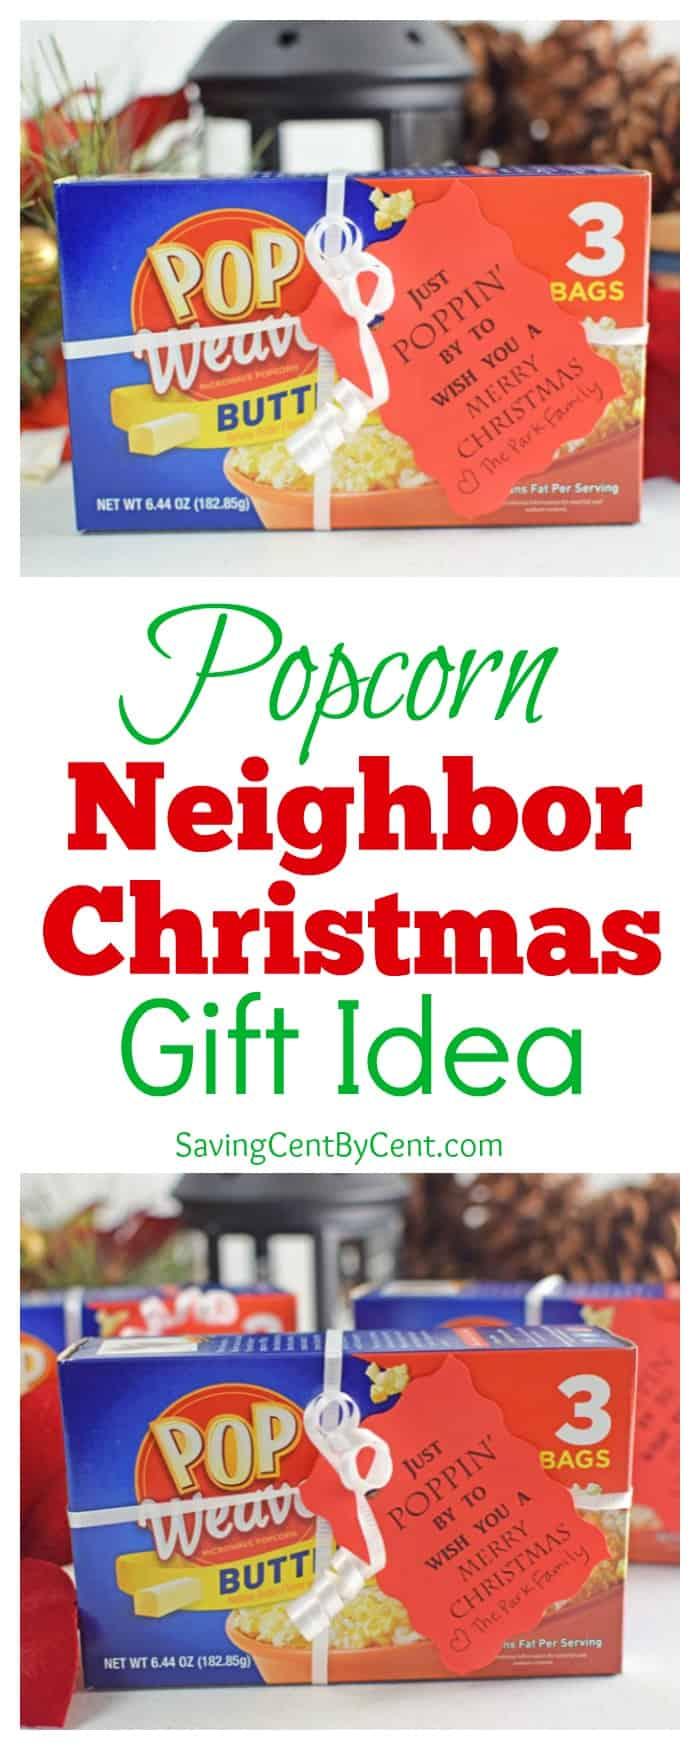 Popcorn Neighbor Christmas Gift Idea